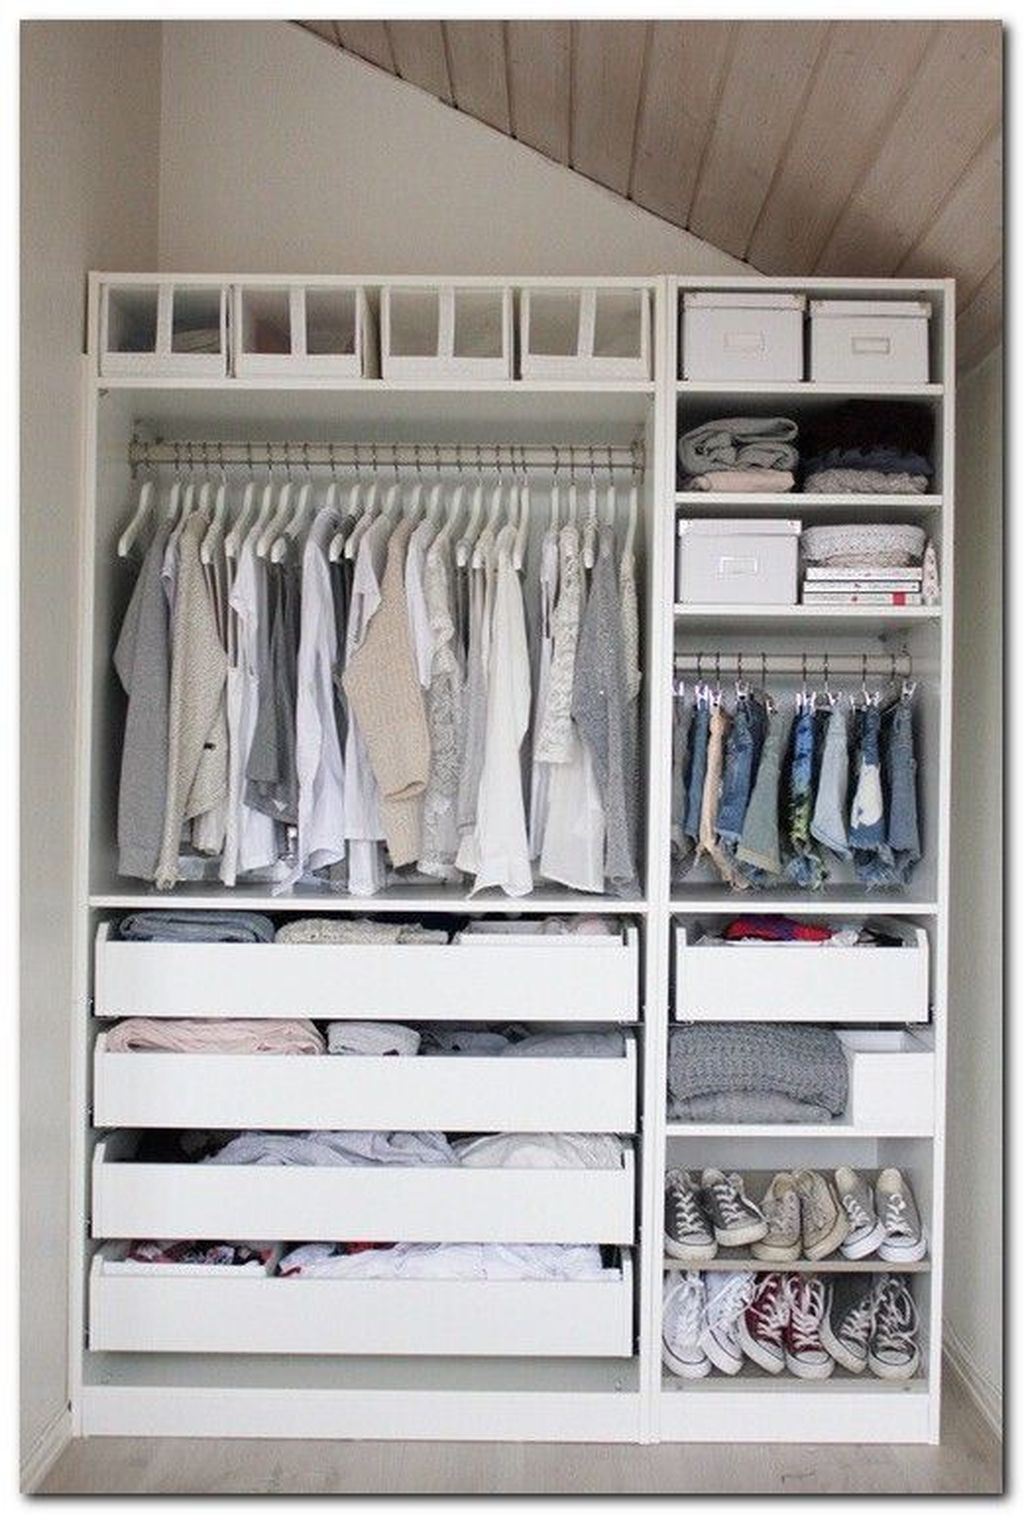 Dreamy Bedroom Organization Ideas That Will Enhance Home Storage 07